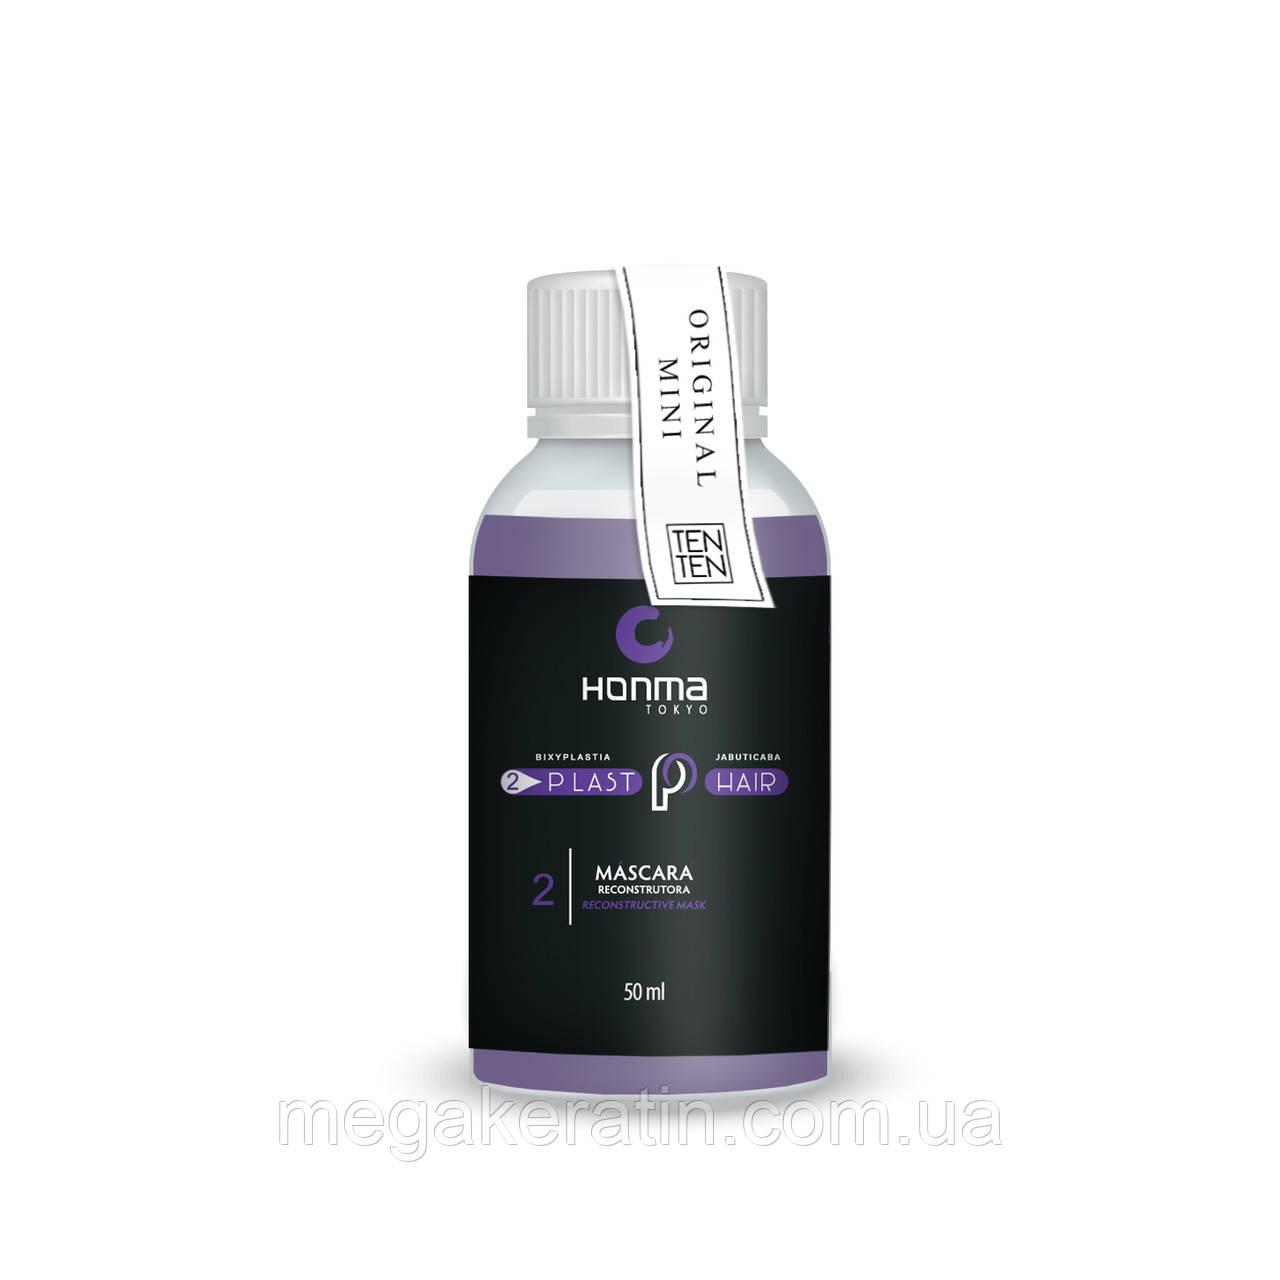 «Plast Hair Bixyplastia Jabuticaba» - Шаг 2 - 50 мл.